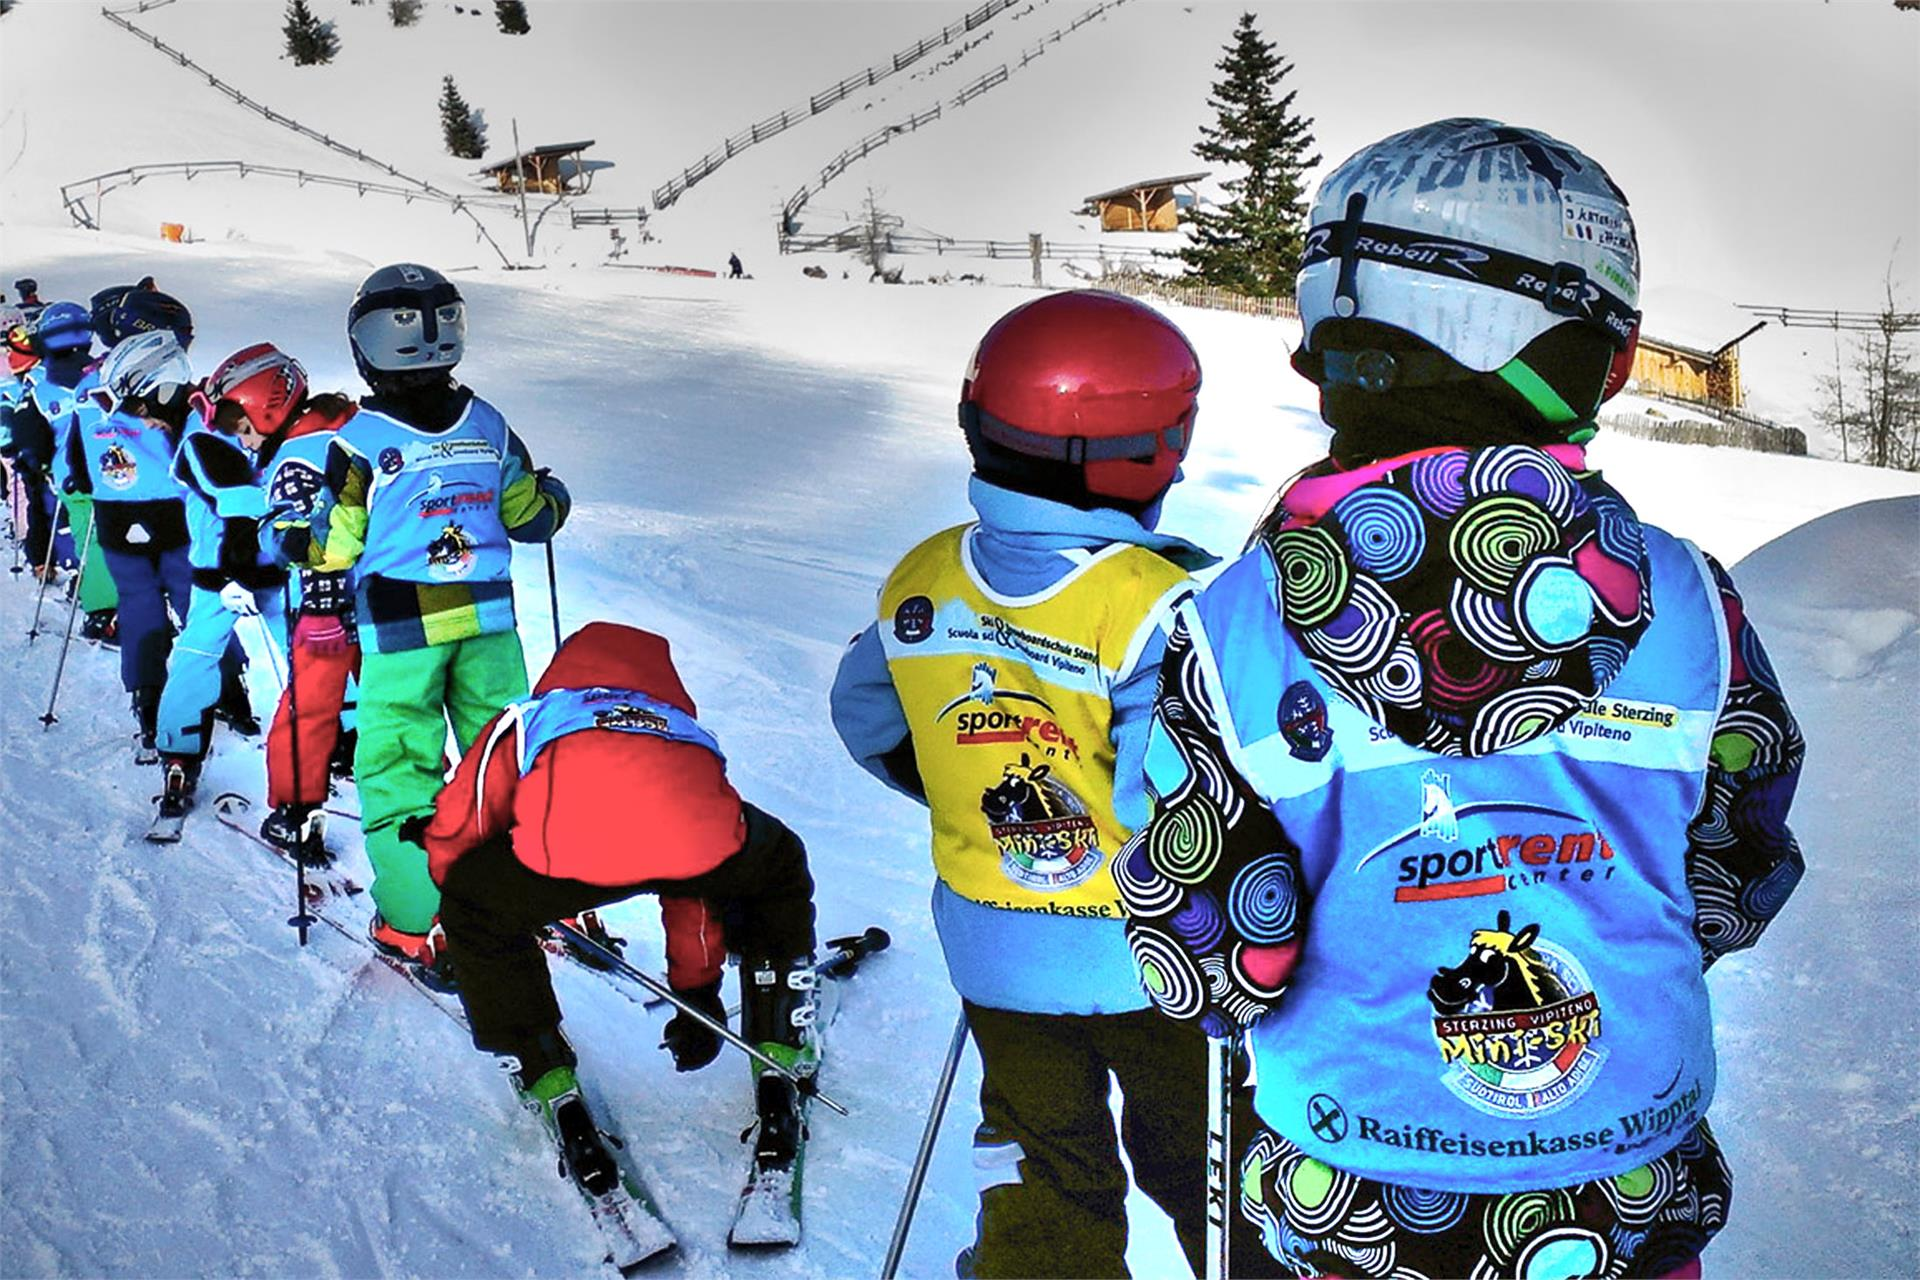 Sterzing ski school